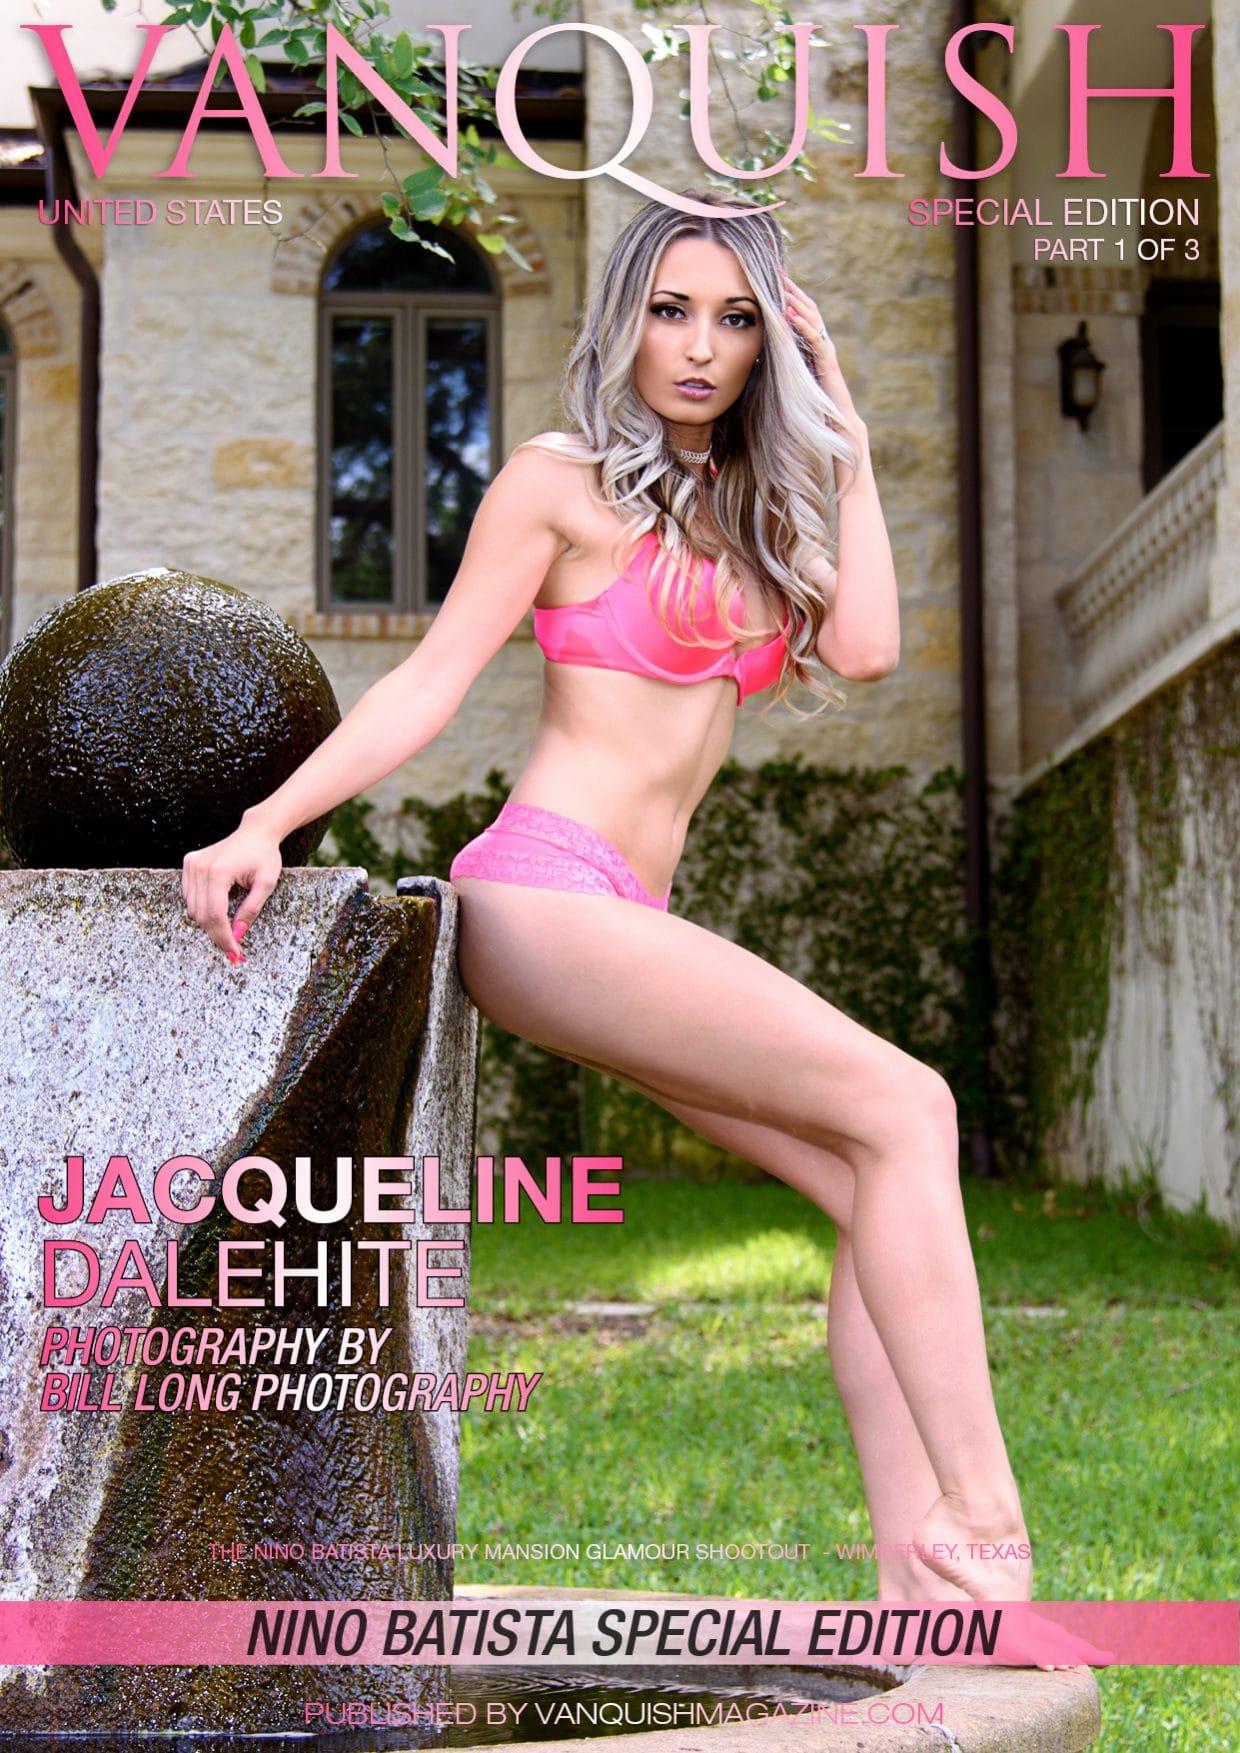 Vanquish - Nino Batista Mansion Shootout Part 1 - Jacqueline Dalehite 1